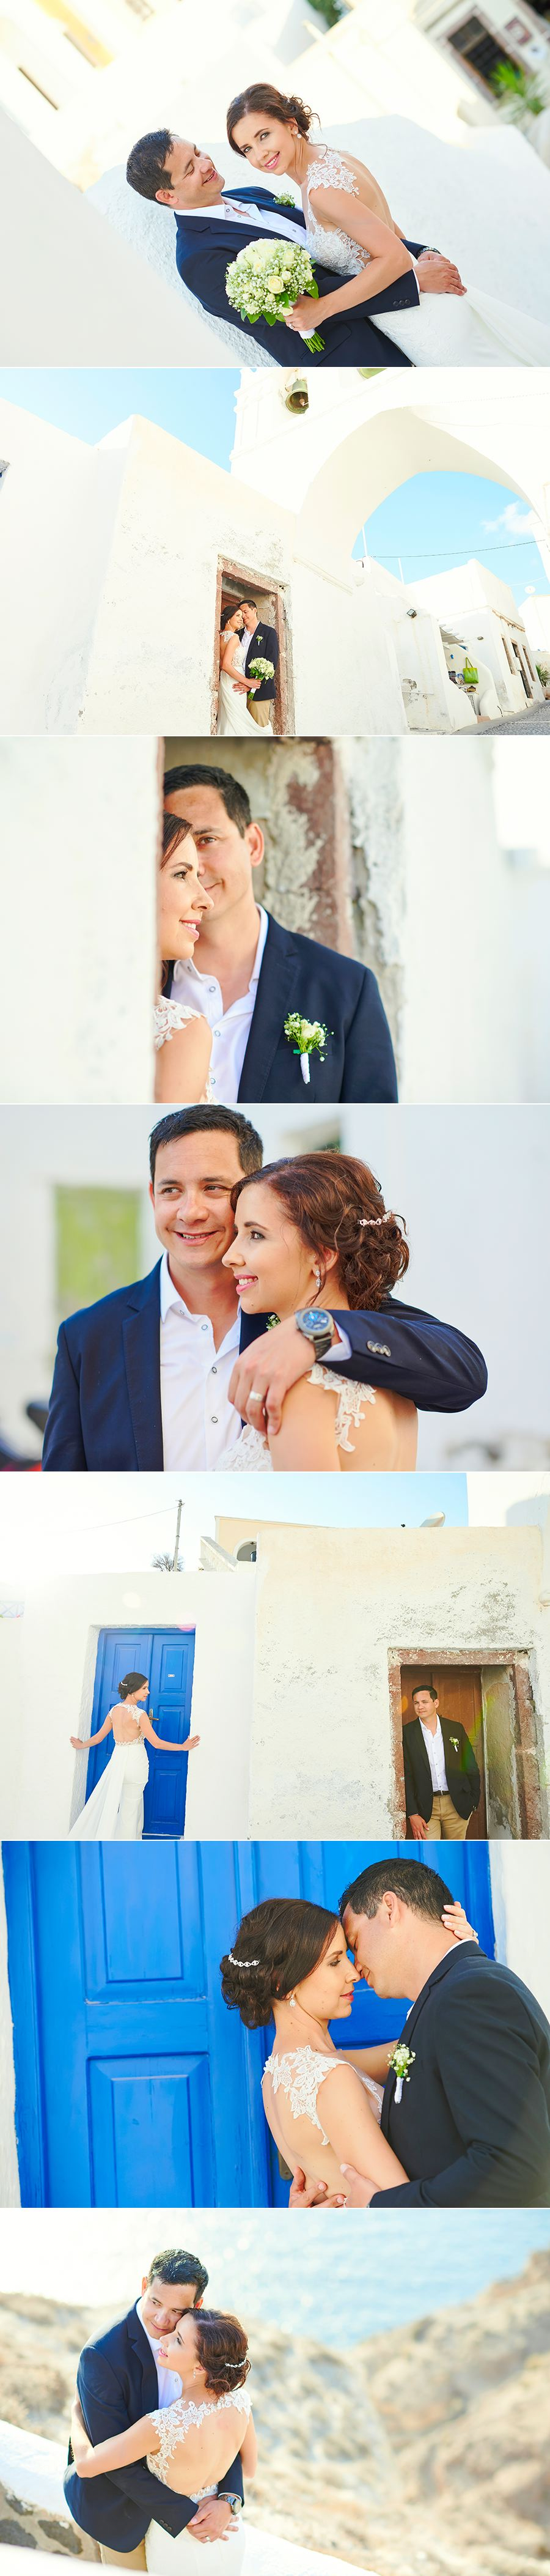 paul-simone-wedding-photos-10